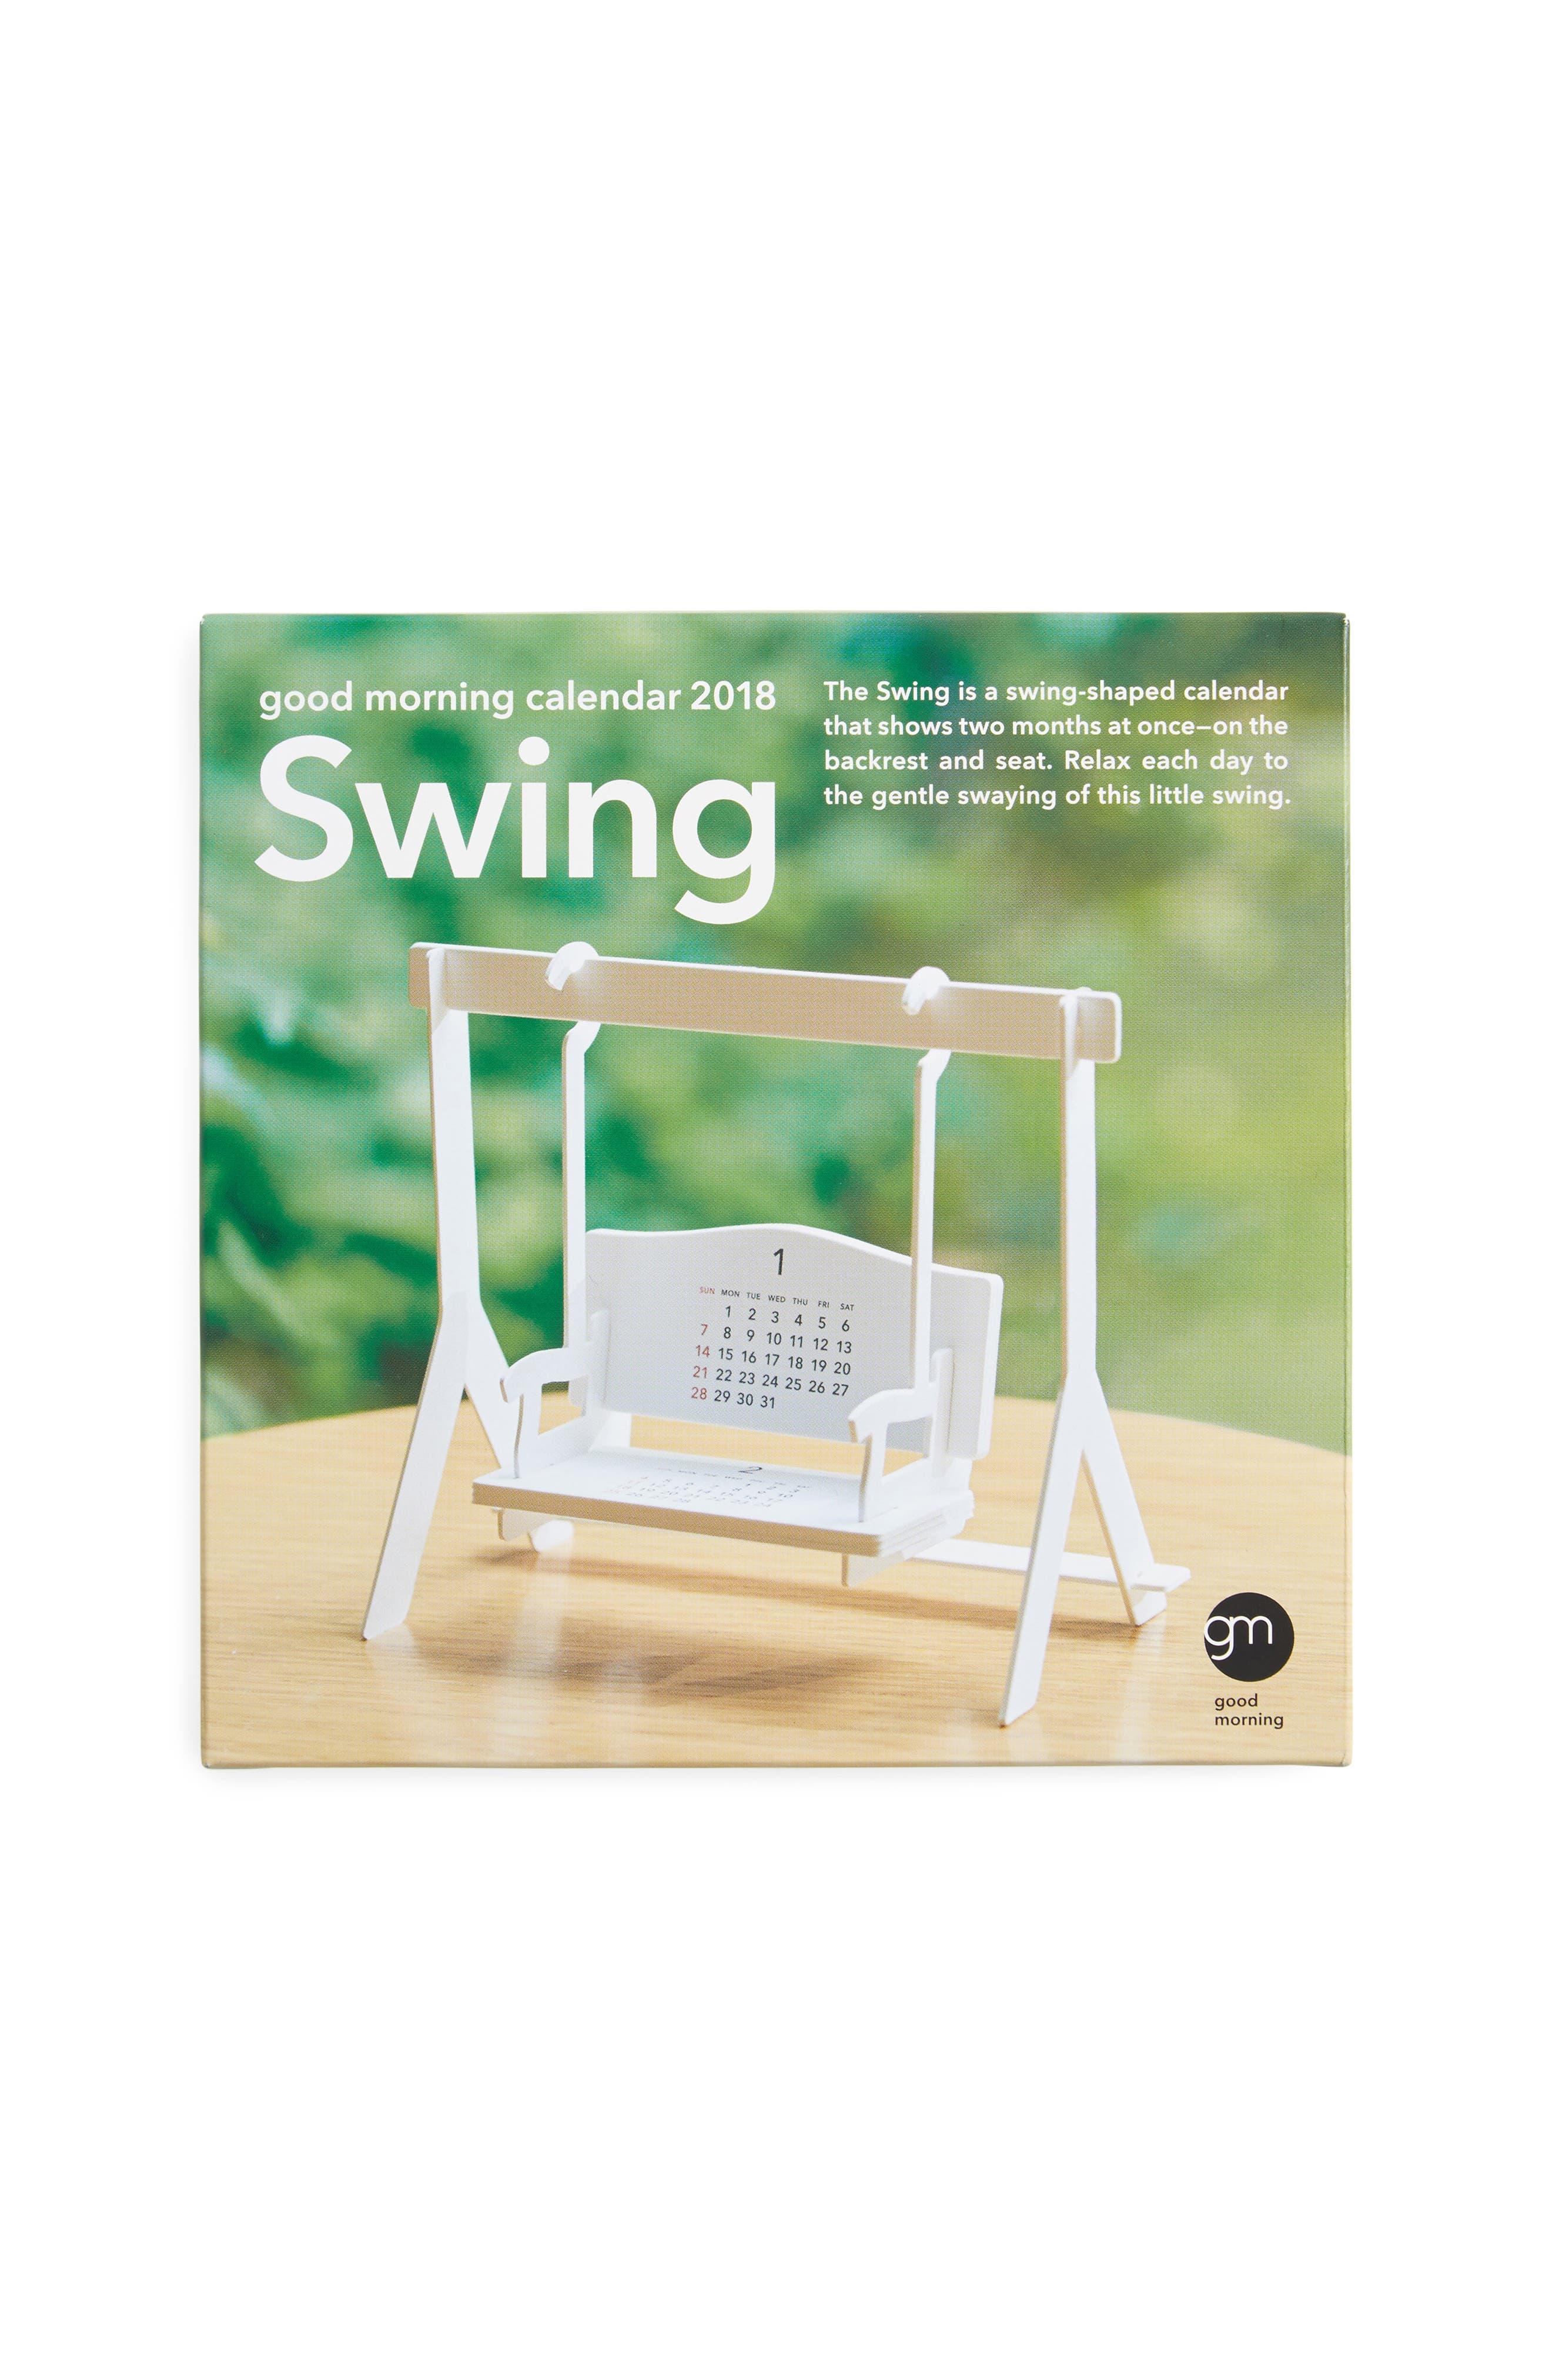 MoMA Design Store 2018 3D Swing Calendar